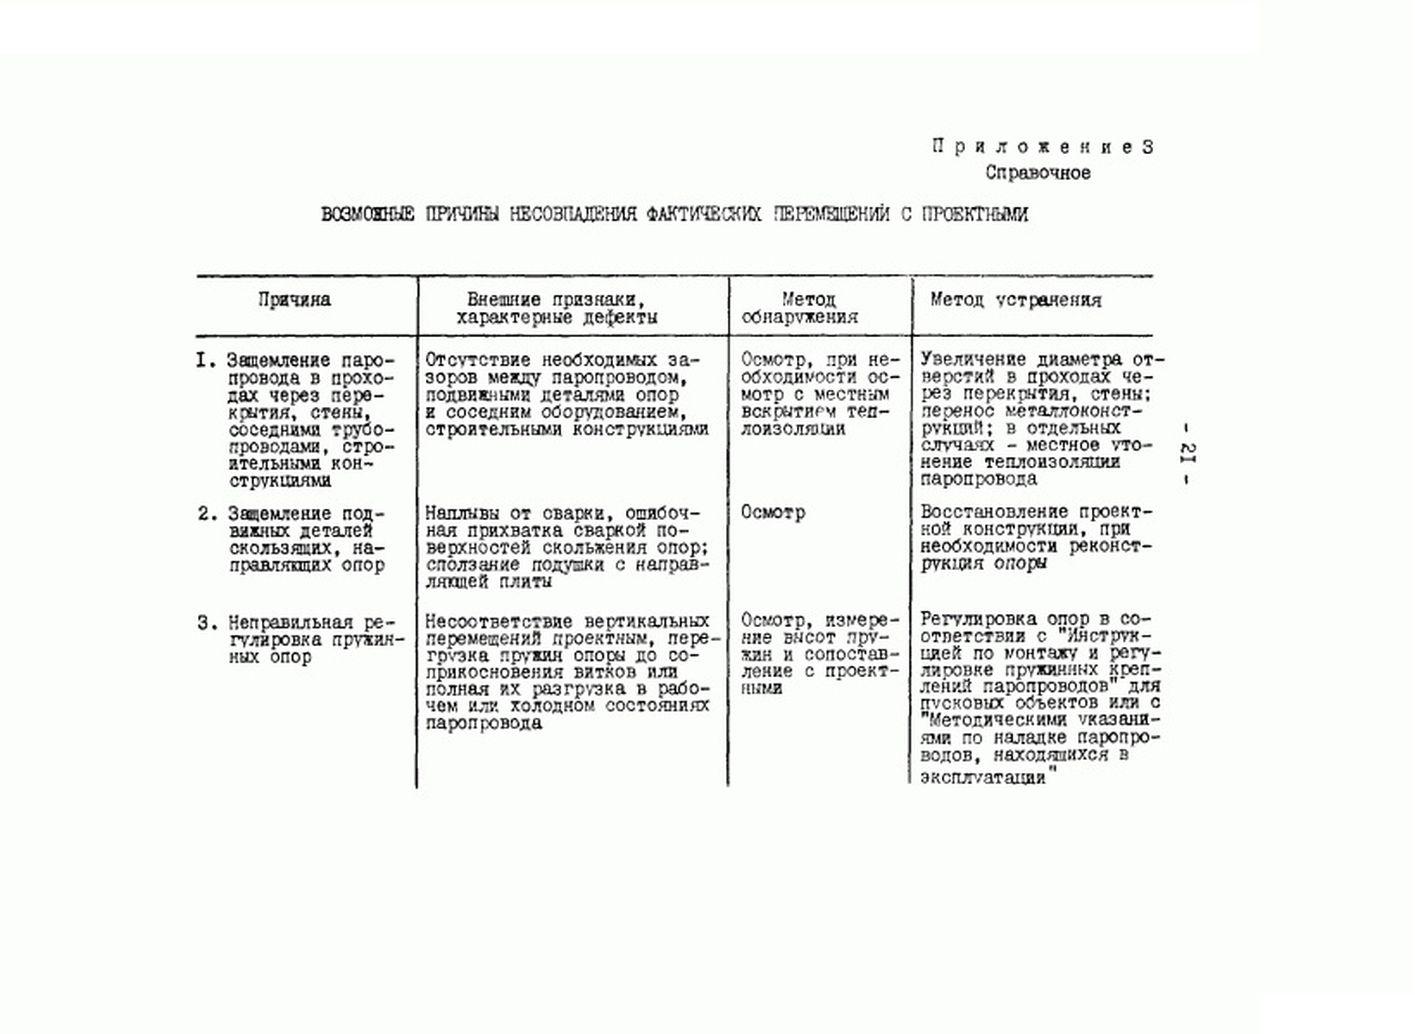 РД 34.39.301-87 стр.21